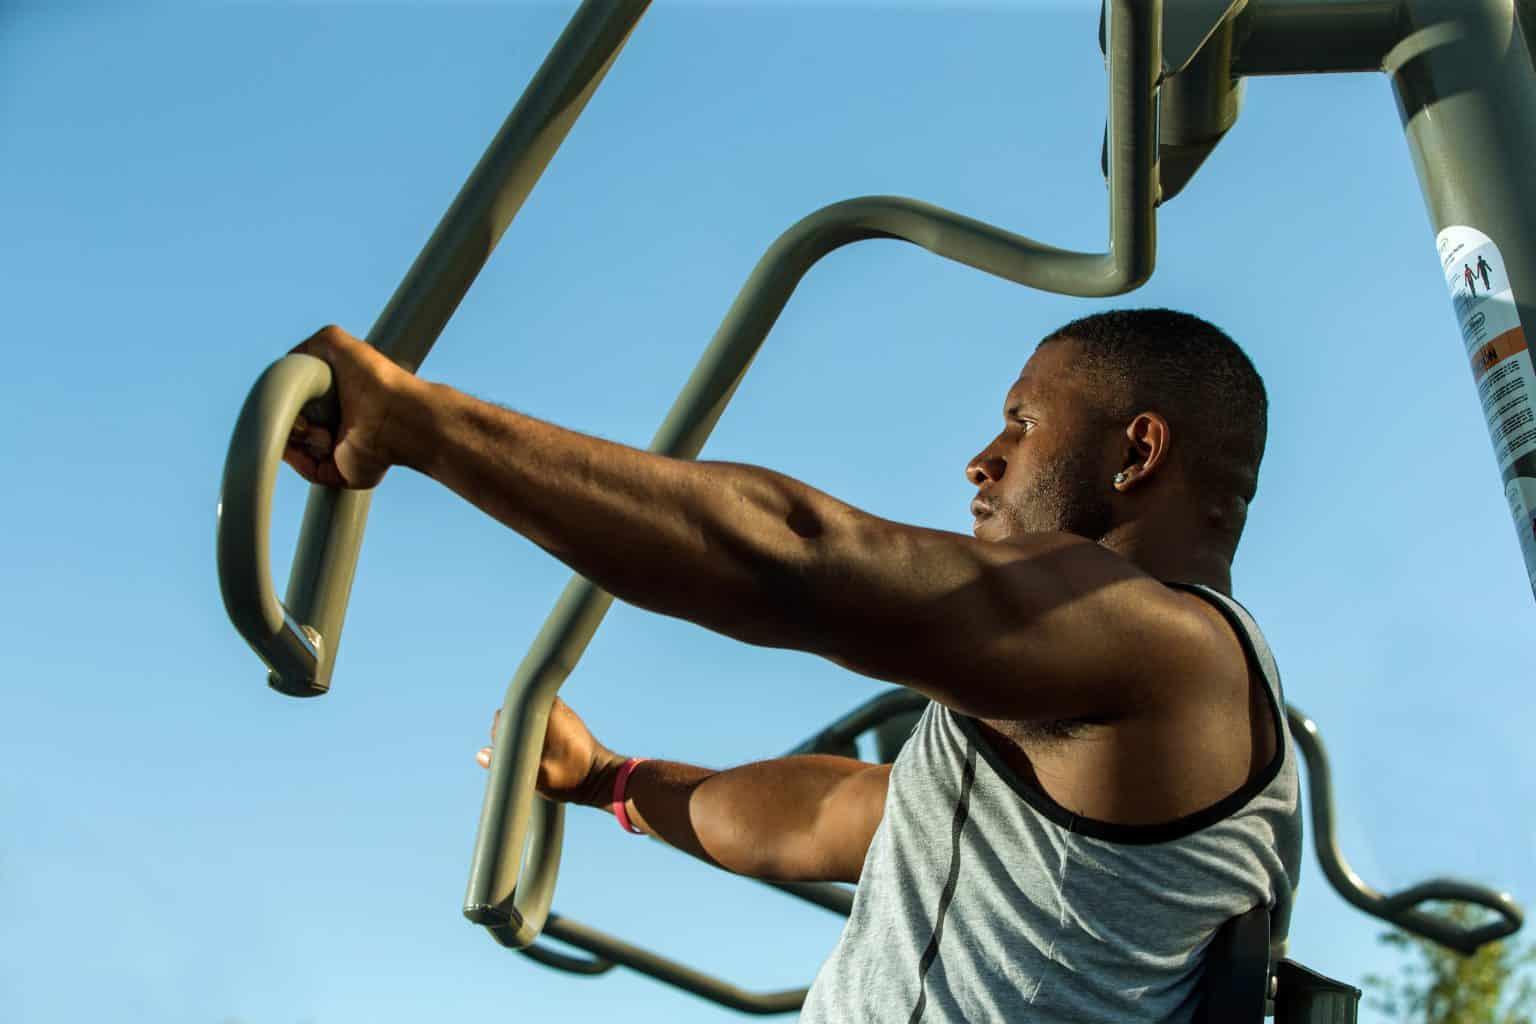 outdoor-fitness-equipment_49643265938_o-1536x1024